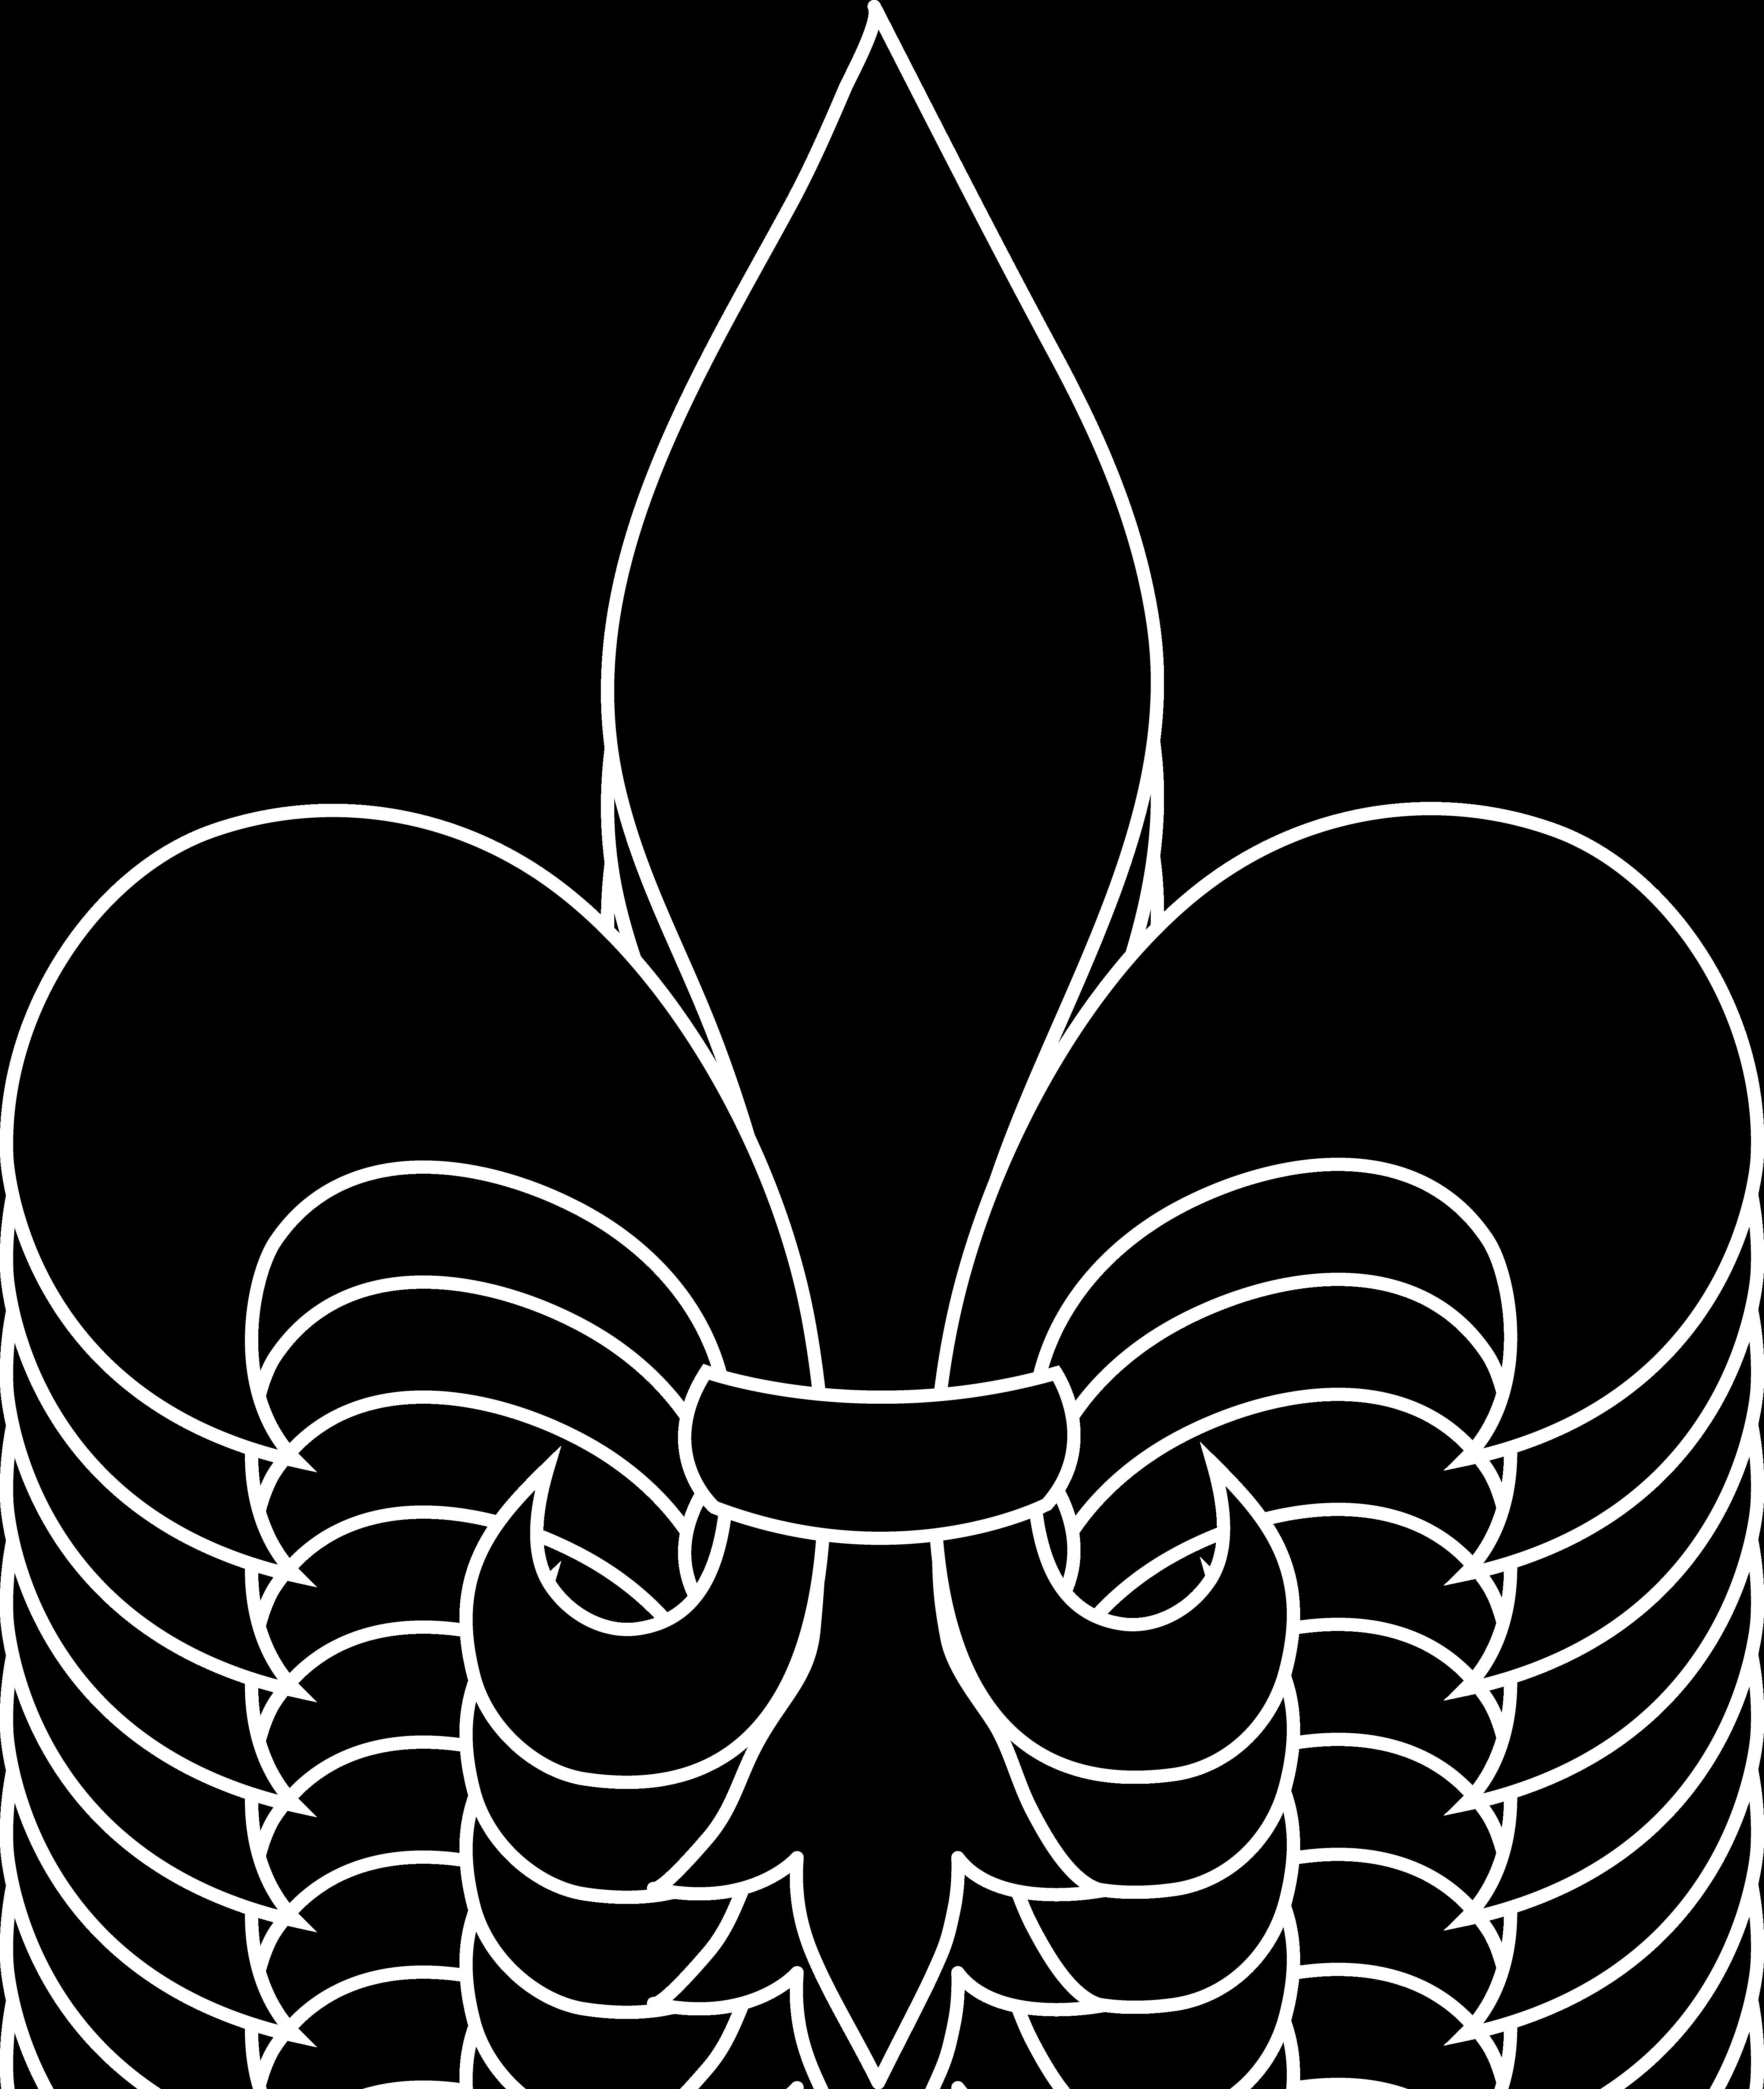 4480x5304 Frrench Free Clip Art Black Fleur De Lis Silhouette For Flyer